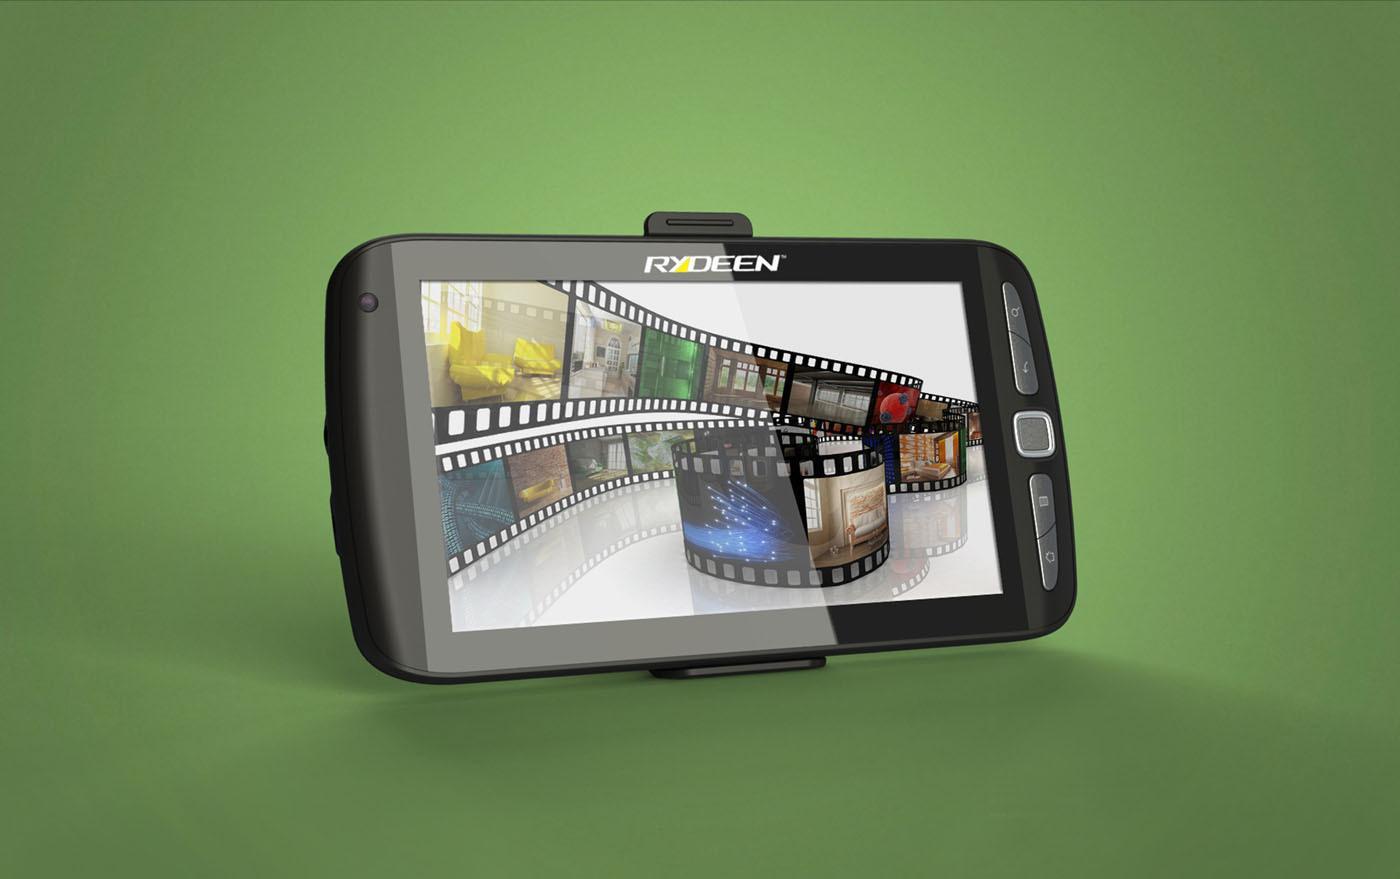 The Rydeen GCOM701 tablet/GPS navigation device